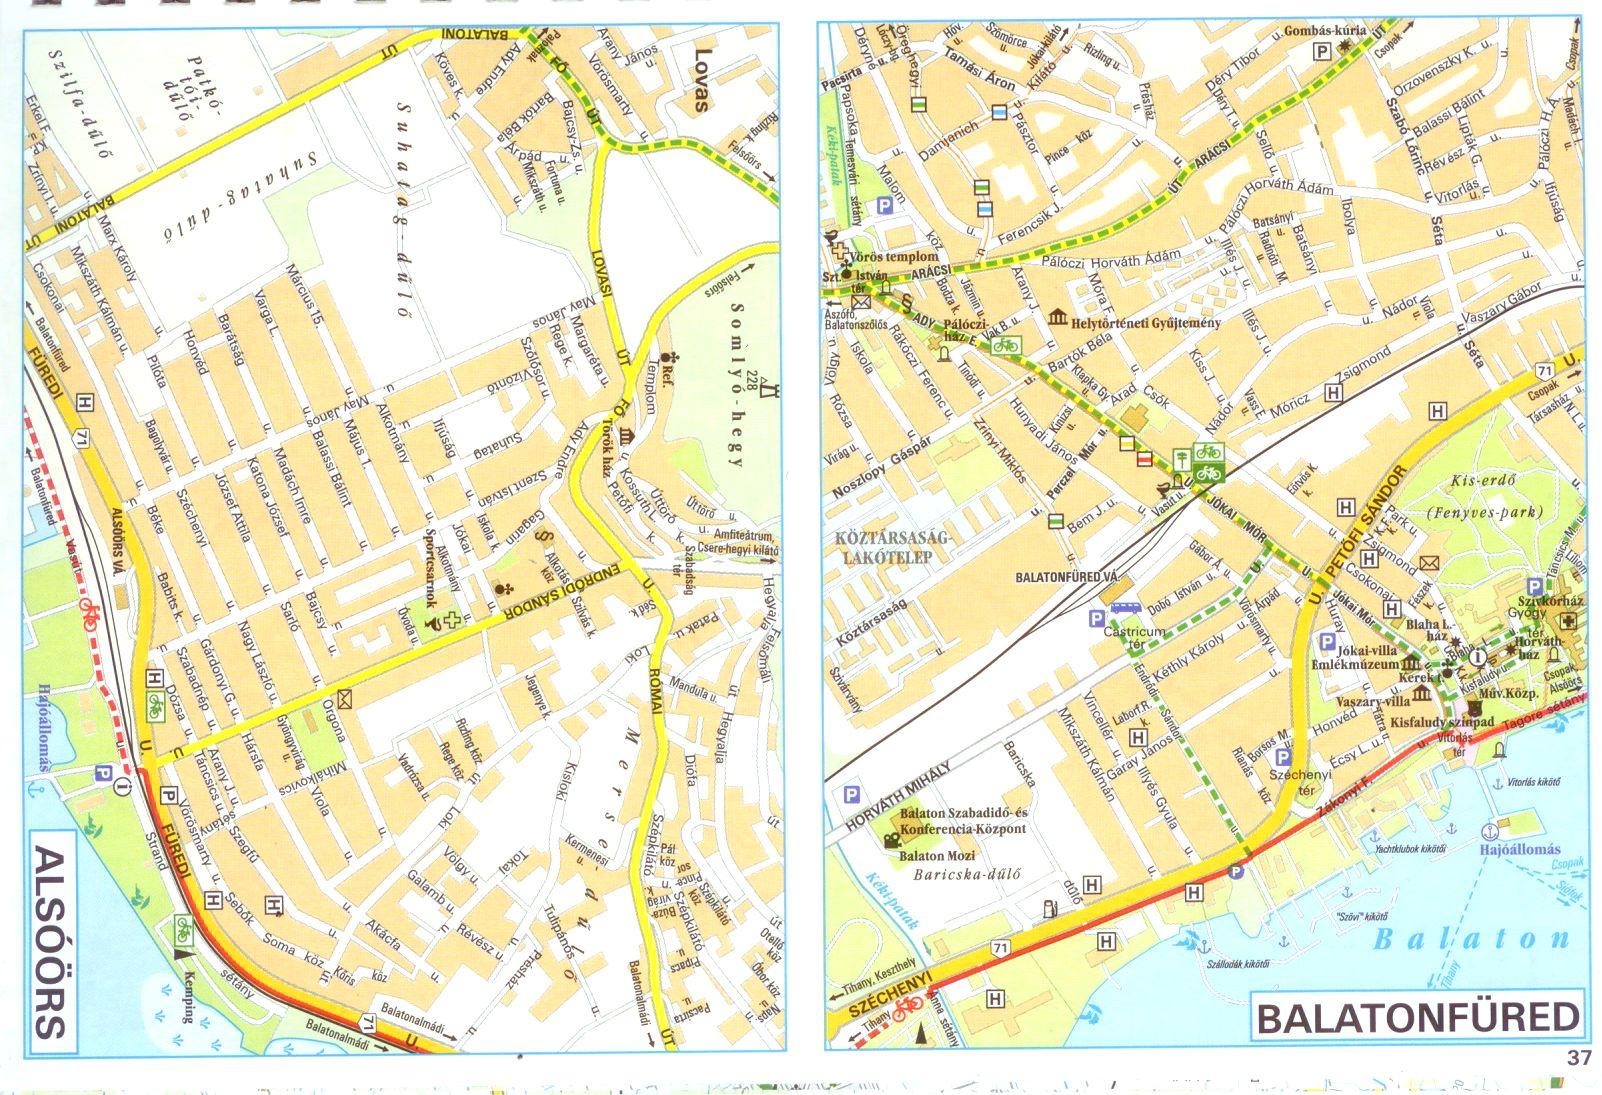 Balaton biking atlas sample city maps